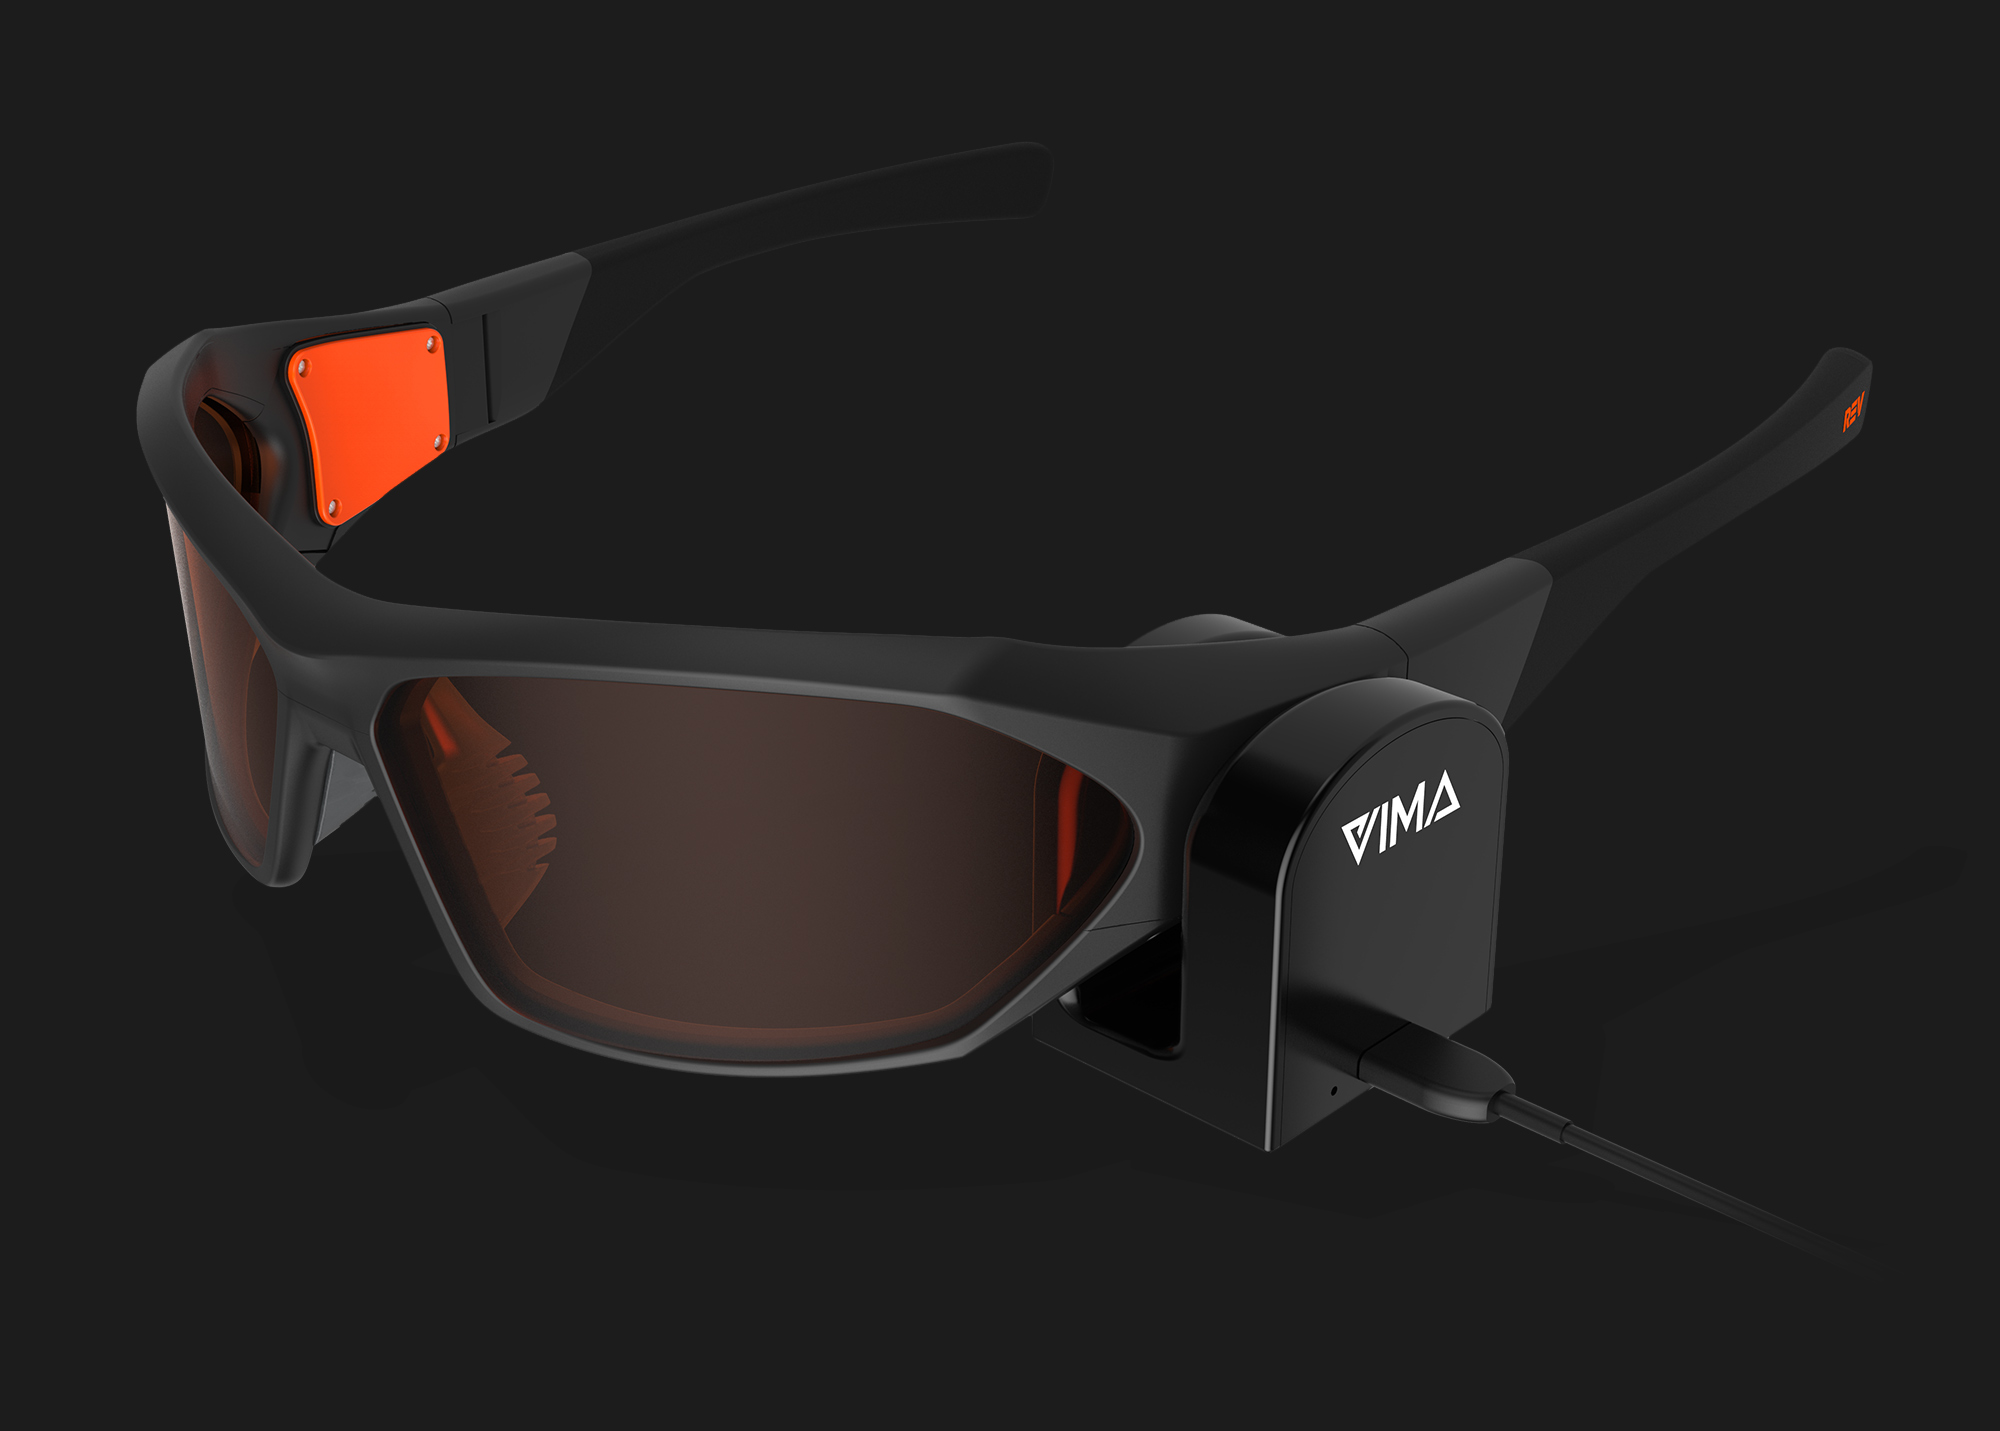 vima-rev-product-render-tactical-01.jpg